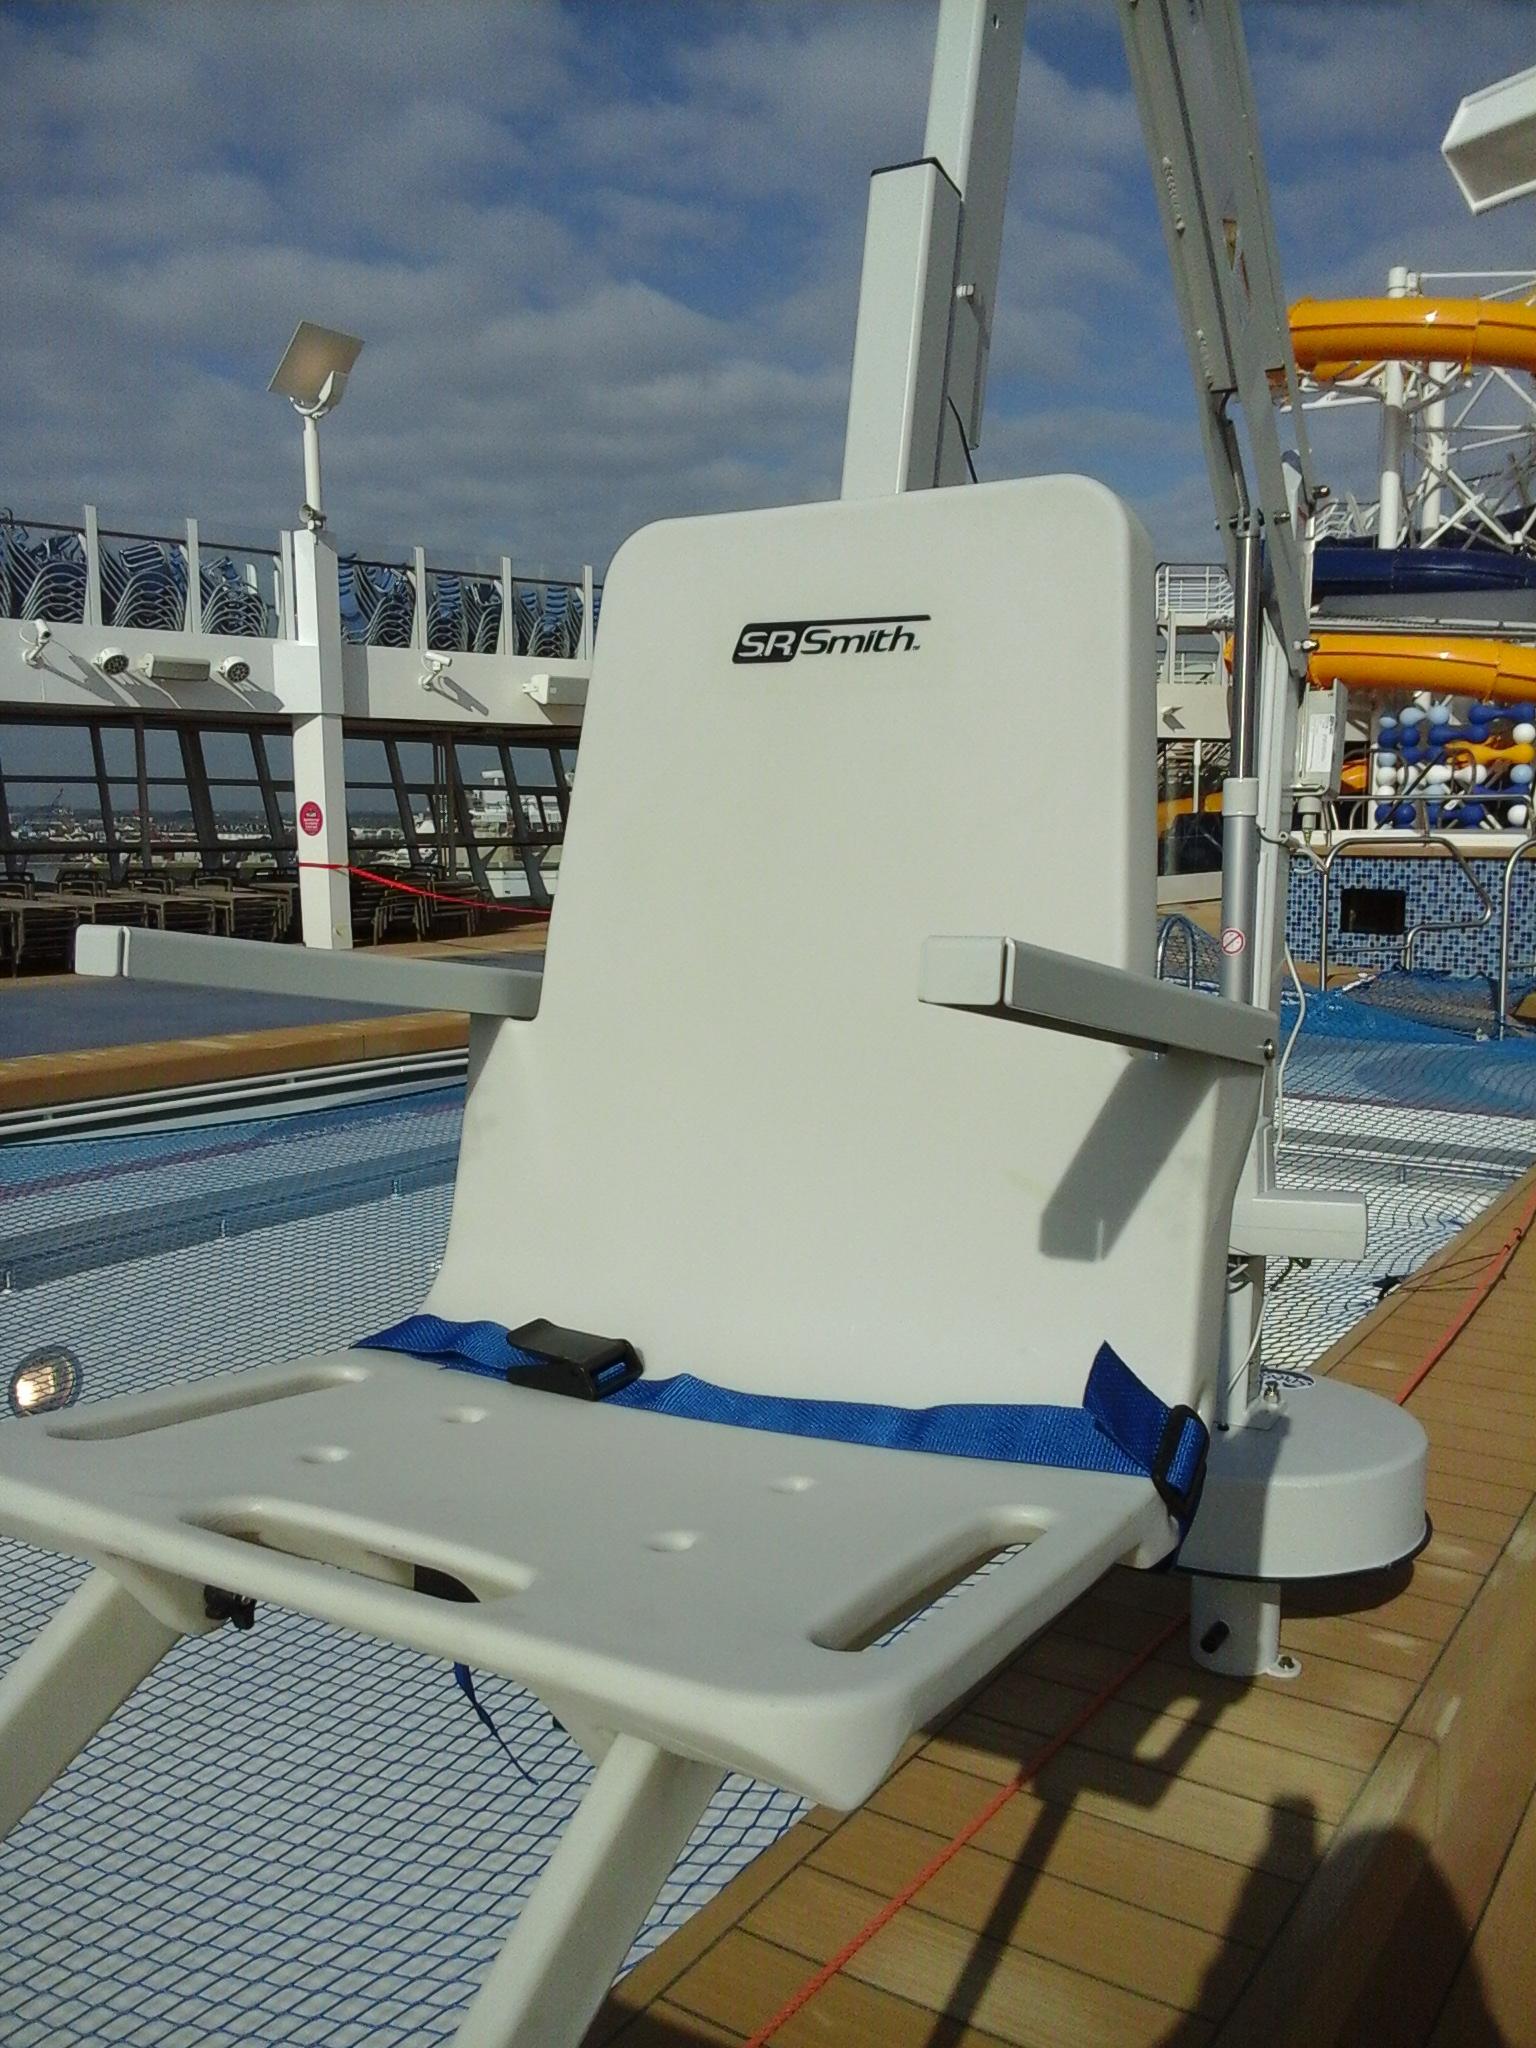 splash-rmt-pool-hoist-seat-cruise-ship-diability-access.jpg